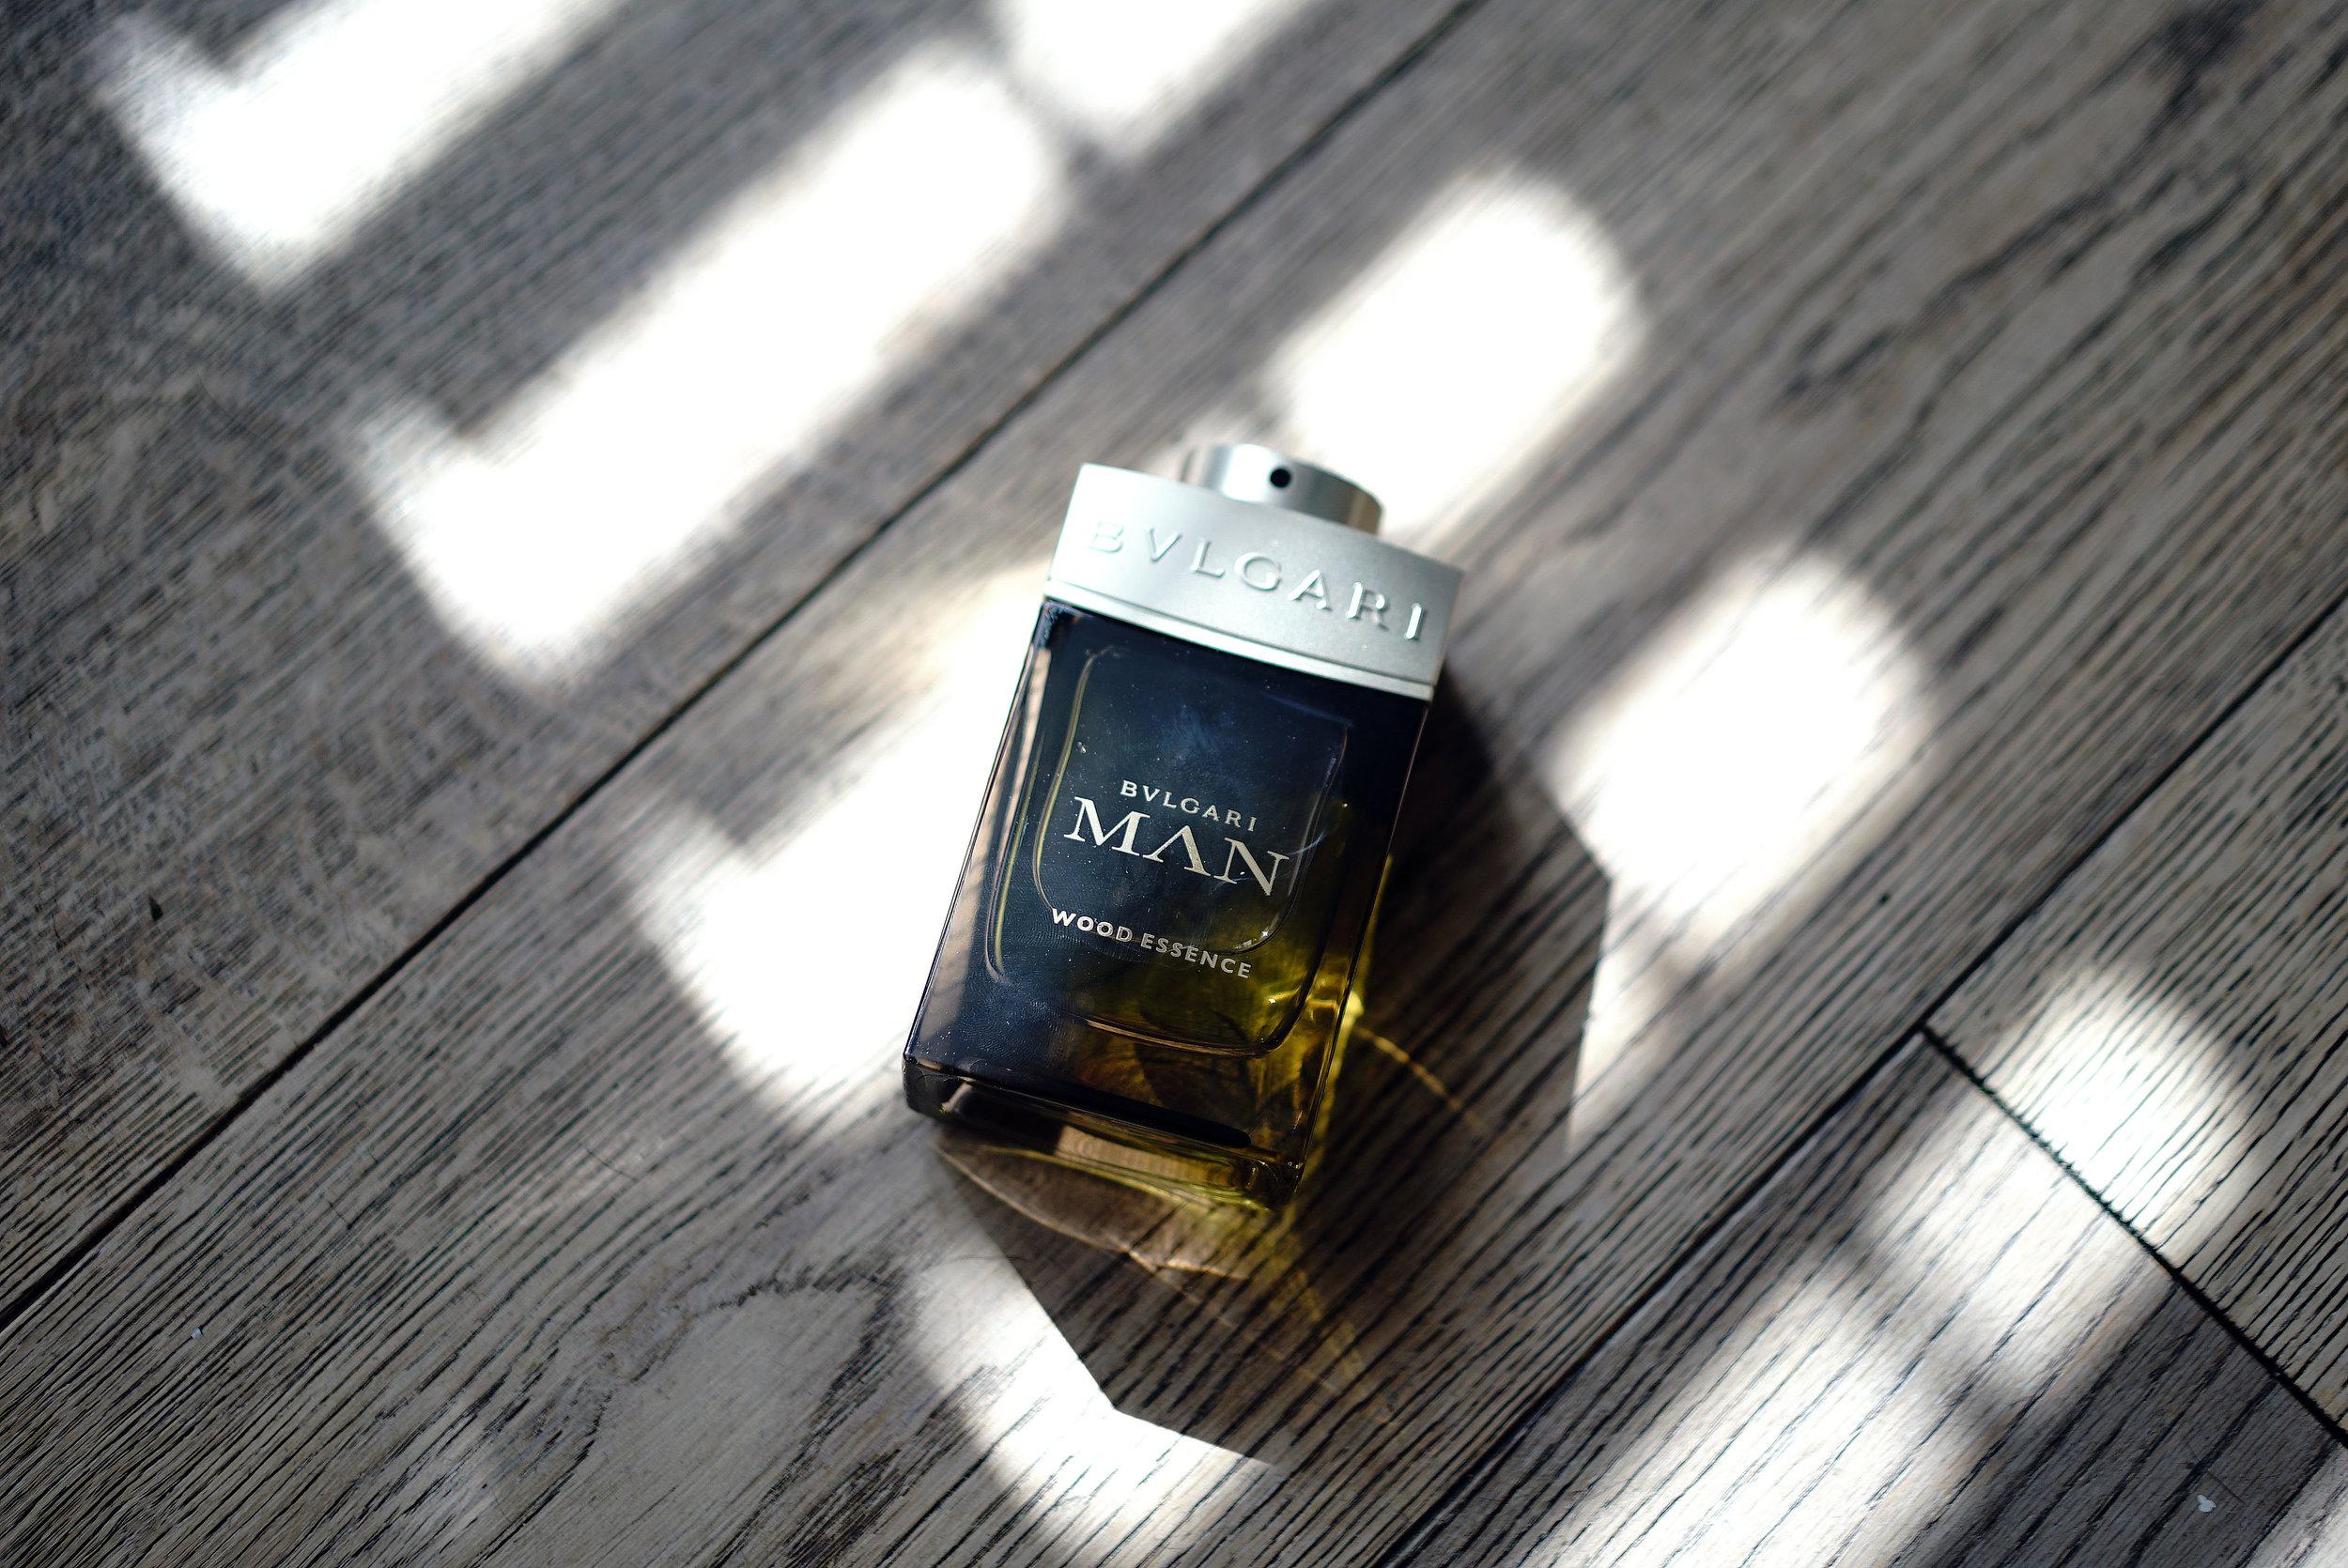 BVLGARI MAN Wood Essence Fragrance.jpg